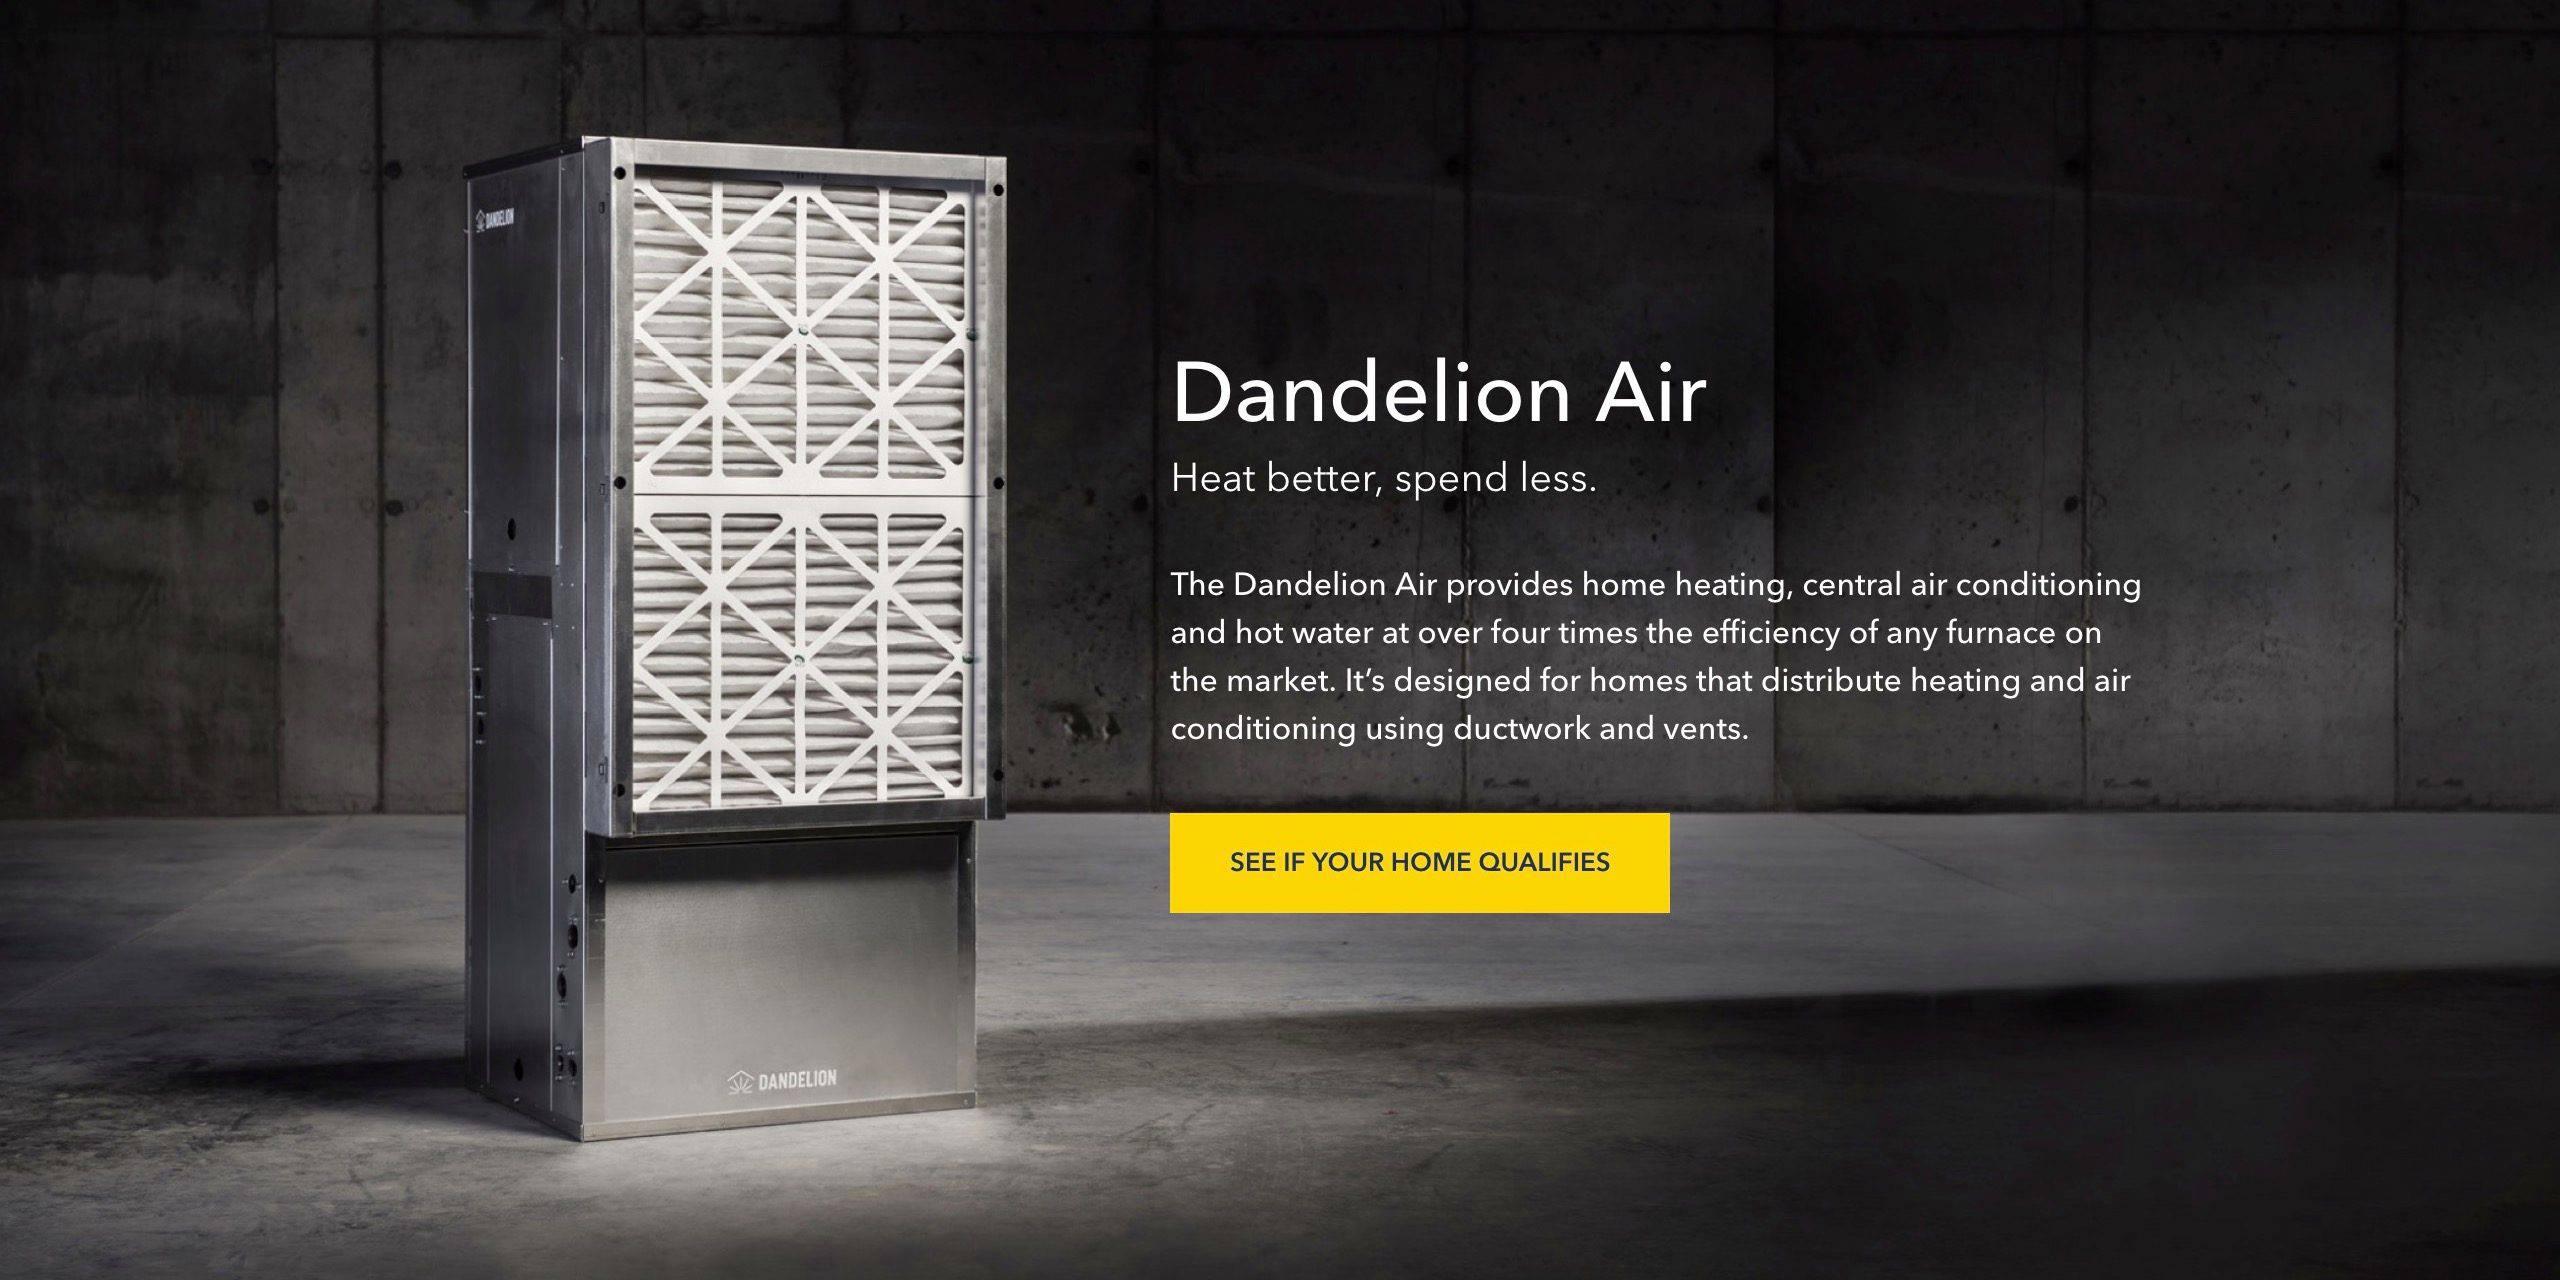 Alphabet's Dandelion air filtration system